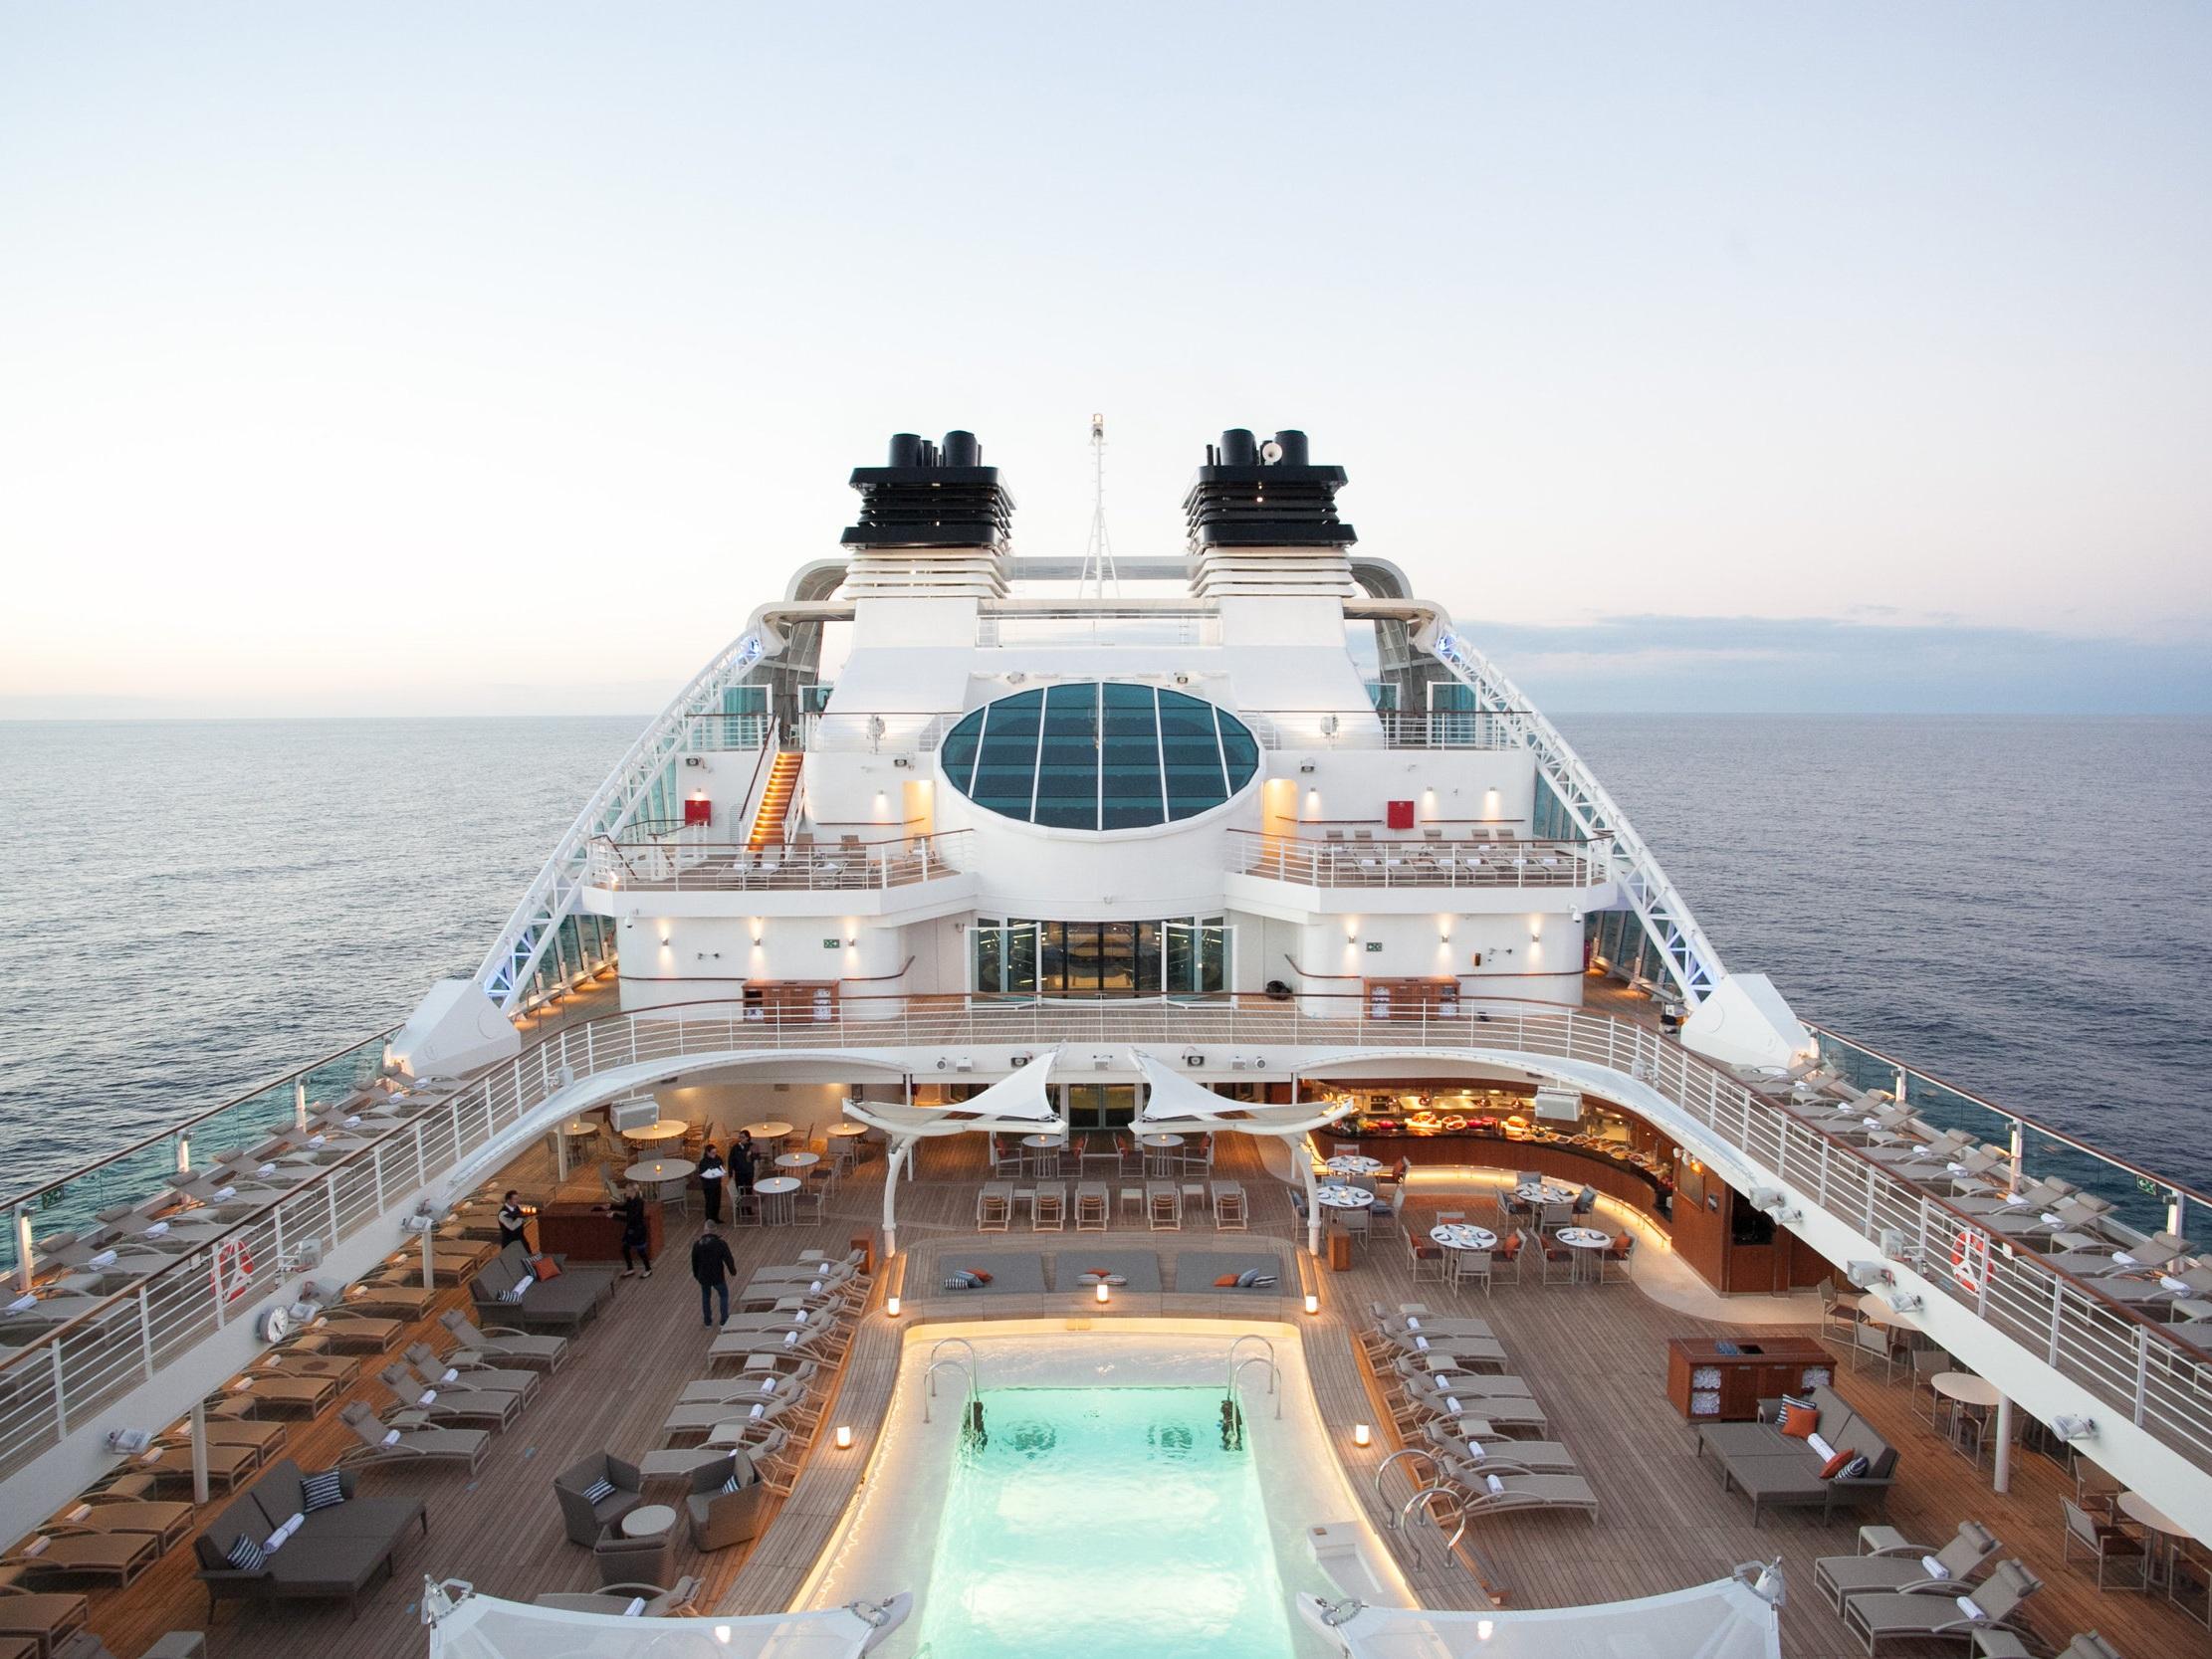 Seabourn+Encore+Pool+Deck+-+Exterior+Ship.jpg